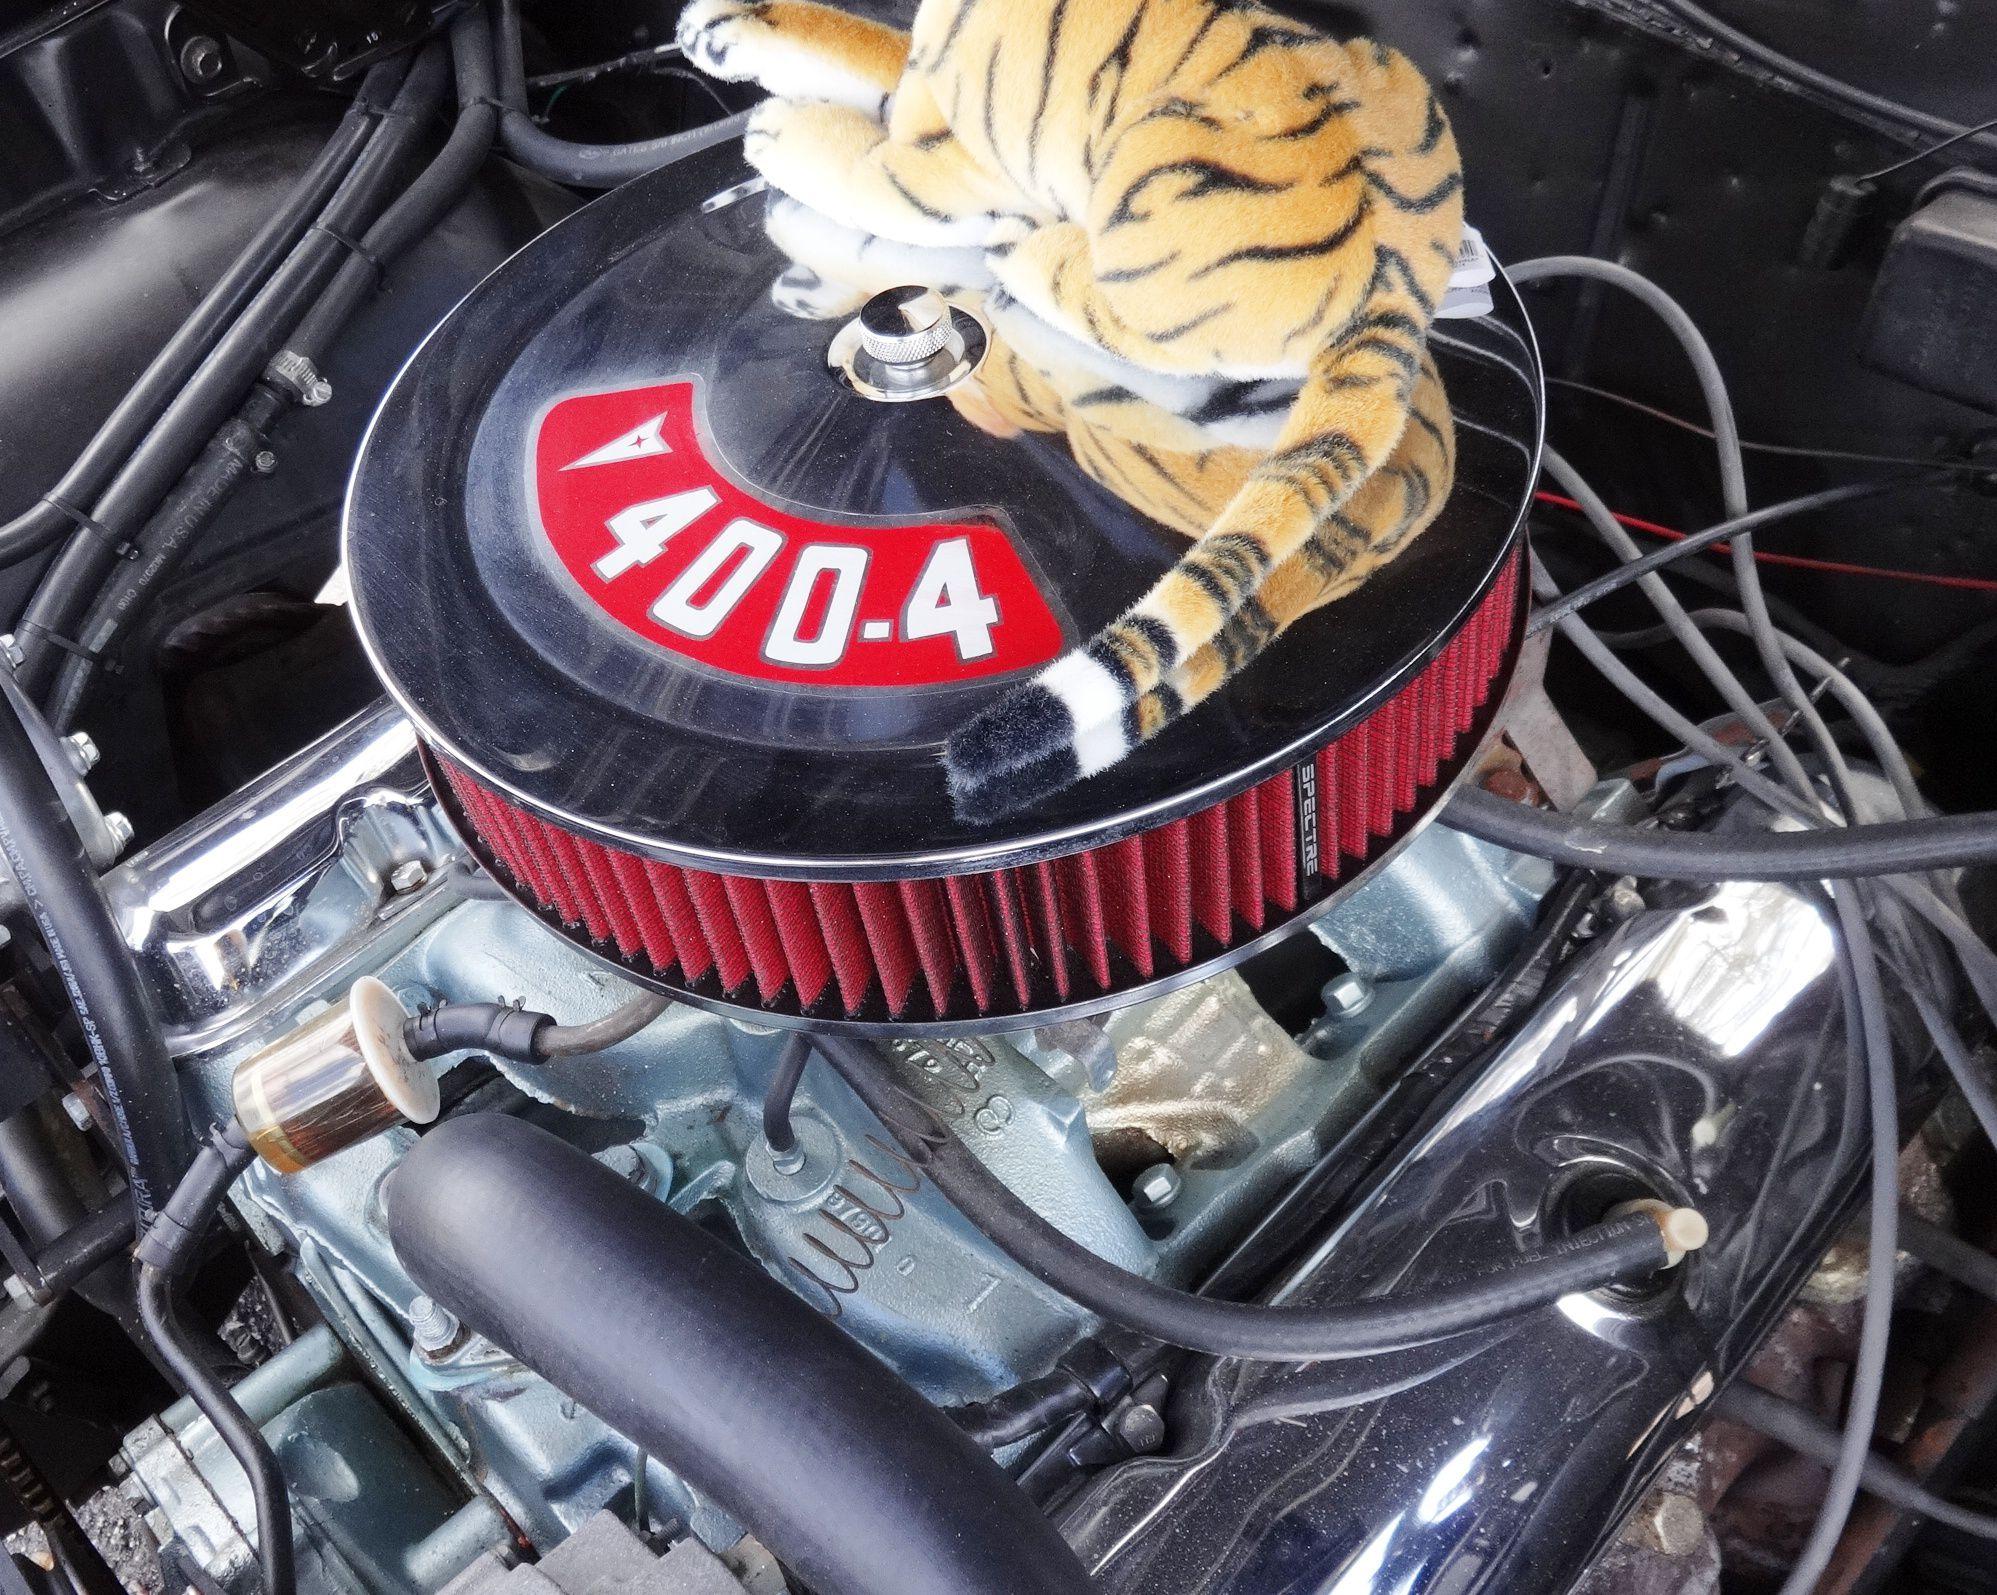 The Legendary Pontiac Ram Air 400 Cubic Inch Engines